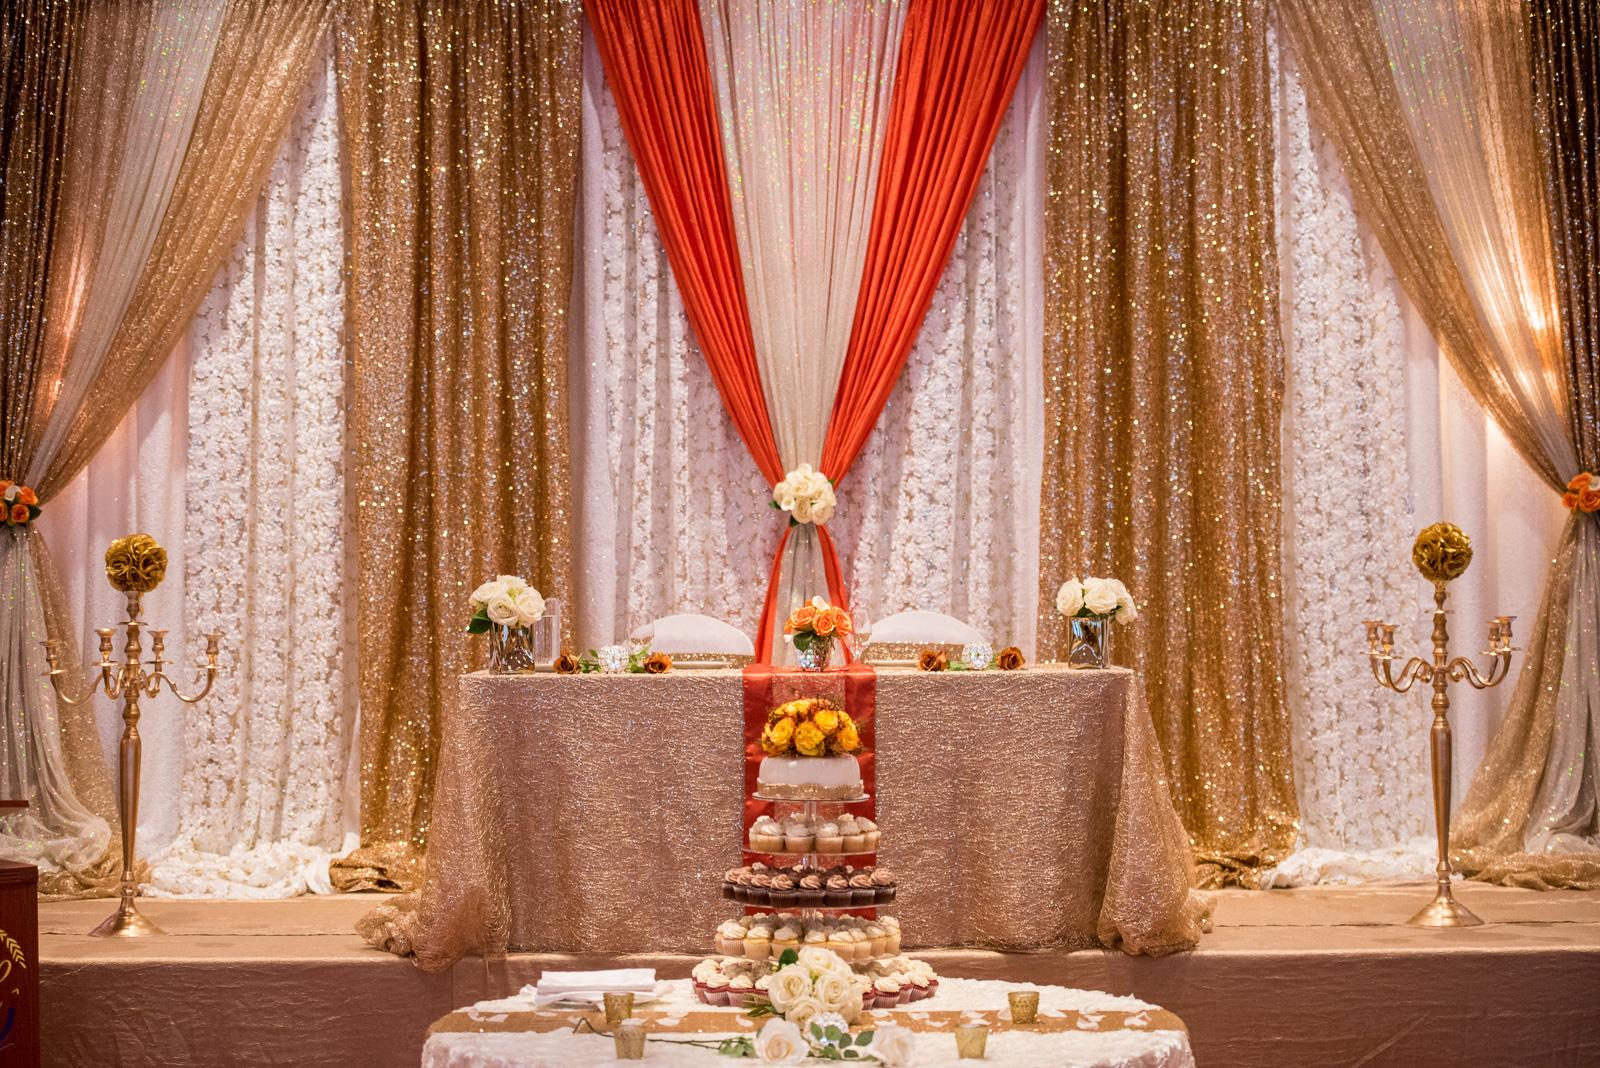 bc-wedding-photographers-paradise-banquet-hall-wedding-30.jpg